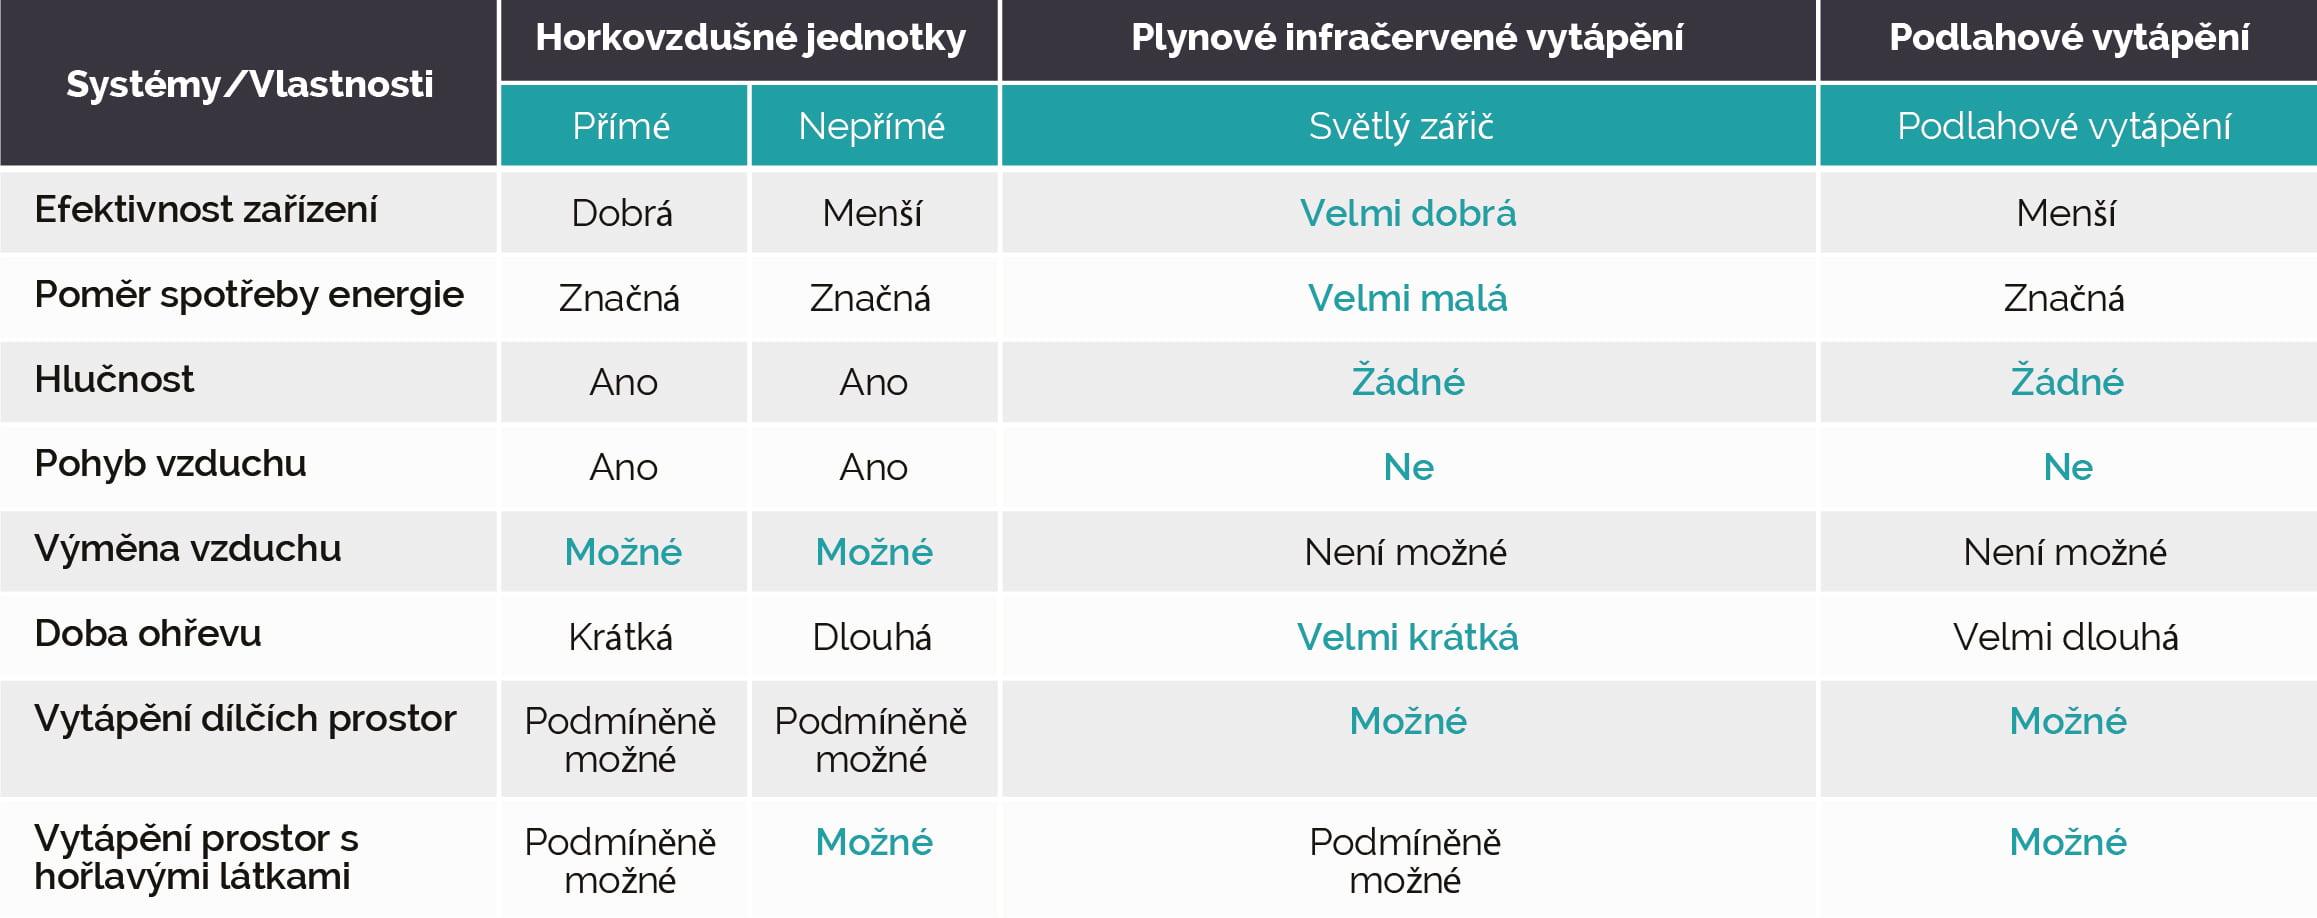 zaric_tabulka-1